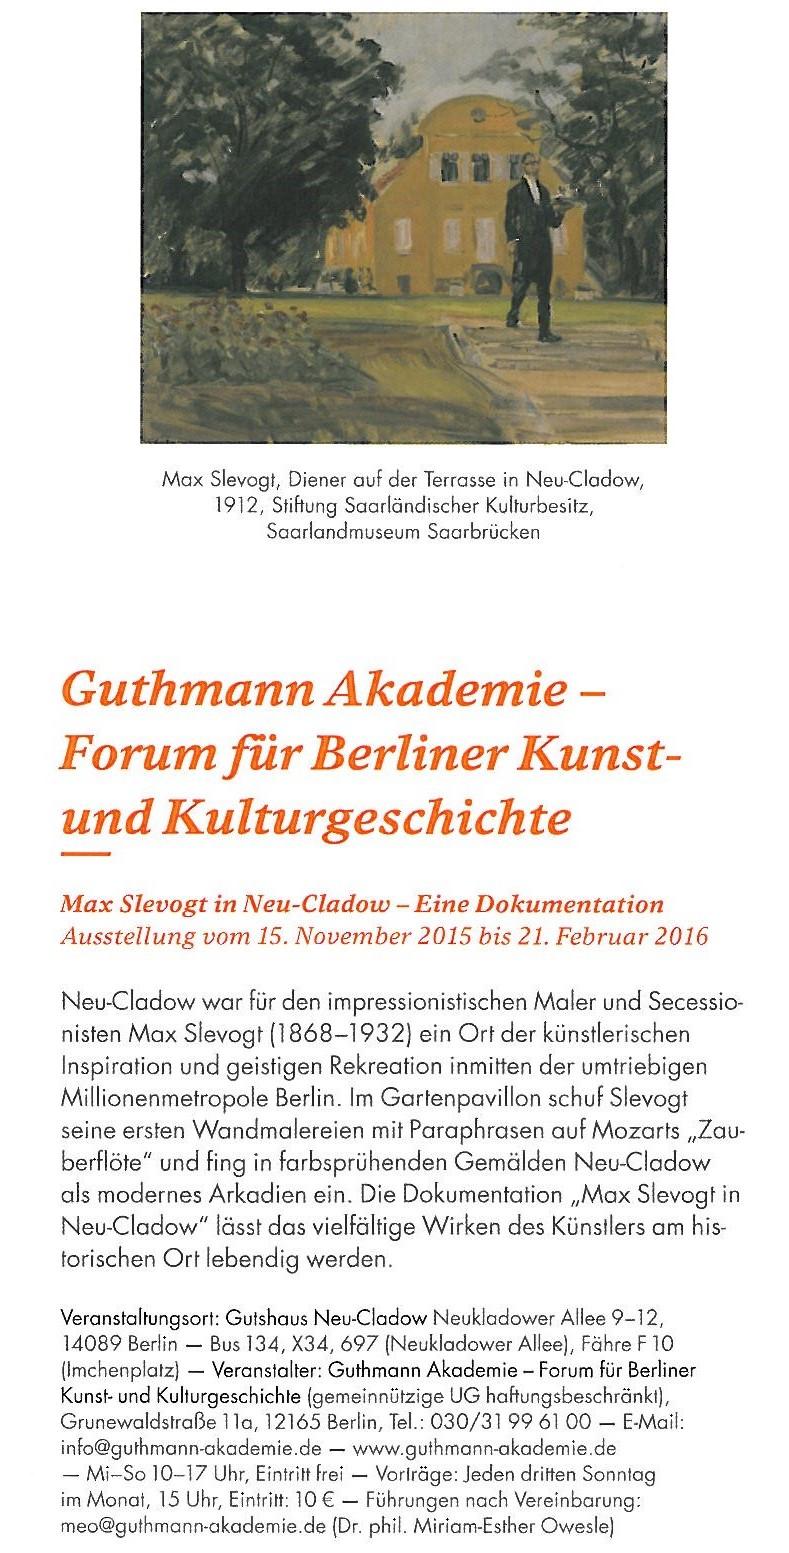 Sechs_Mal_Secession_Guthmann_Akademie